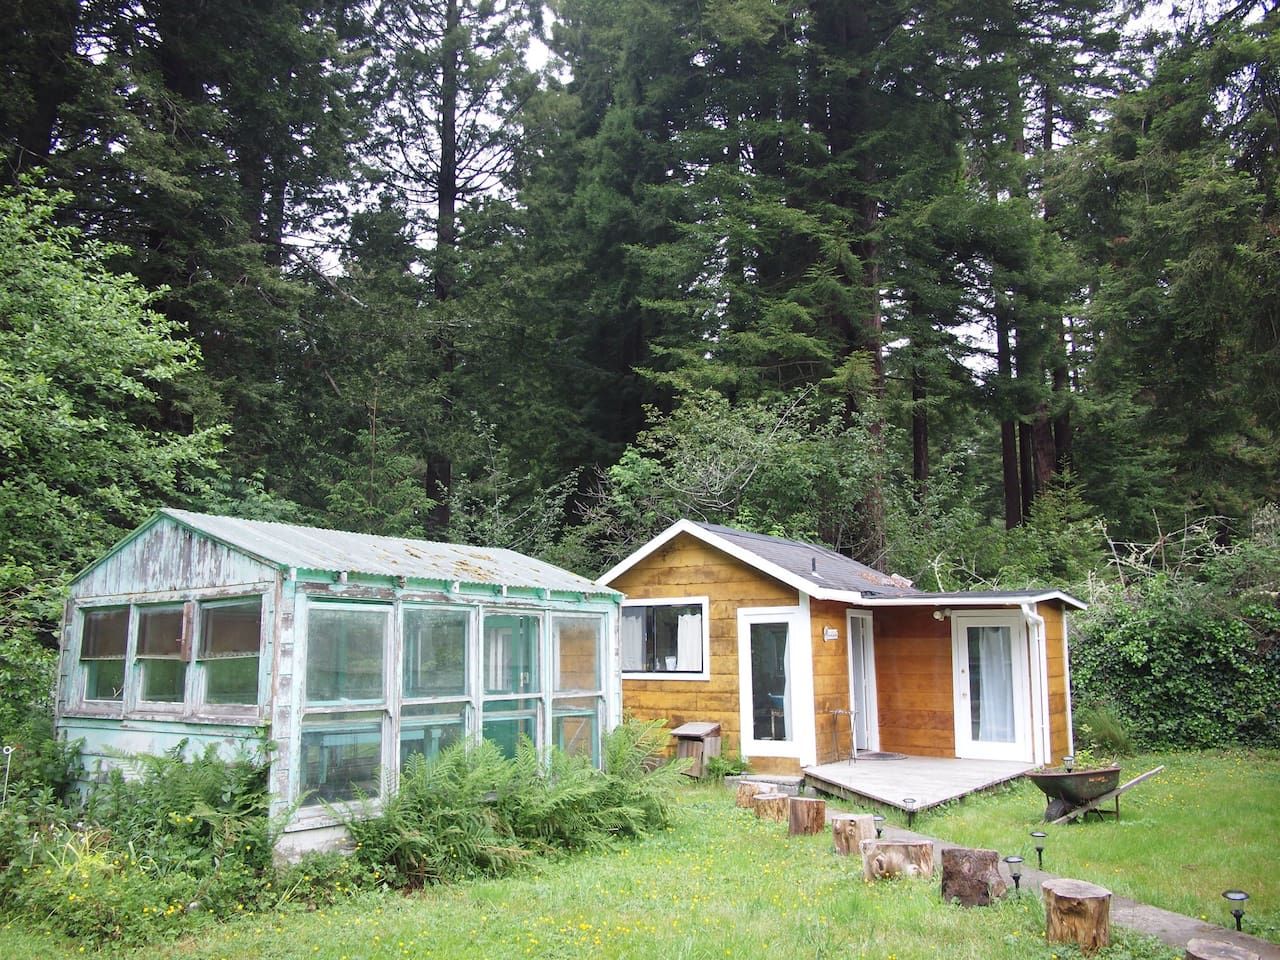 Greenhouse and Mini House